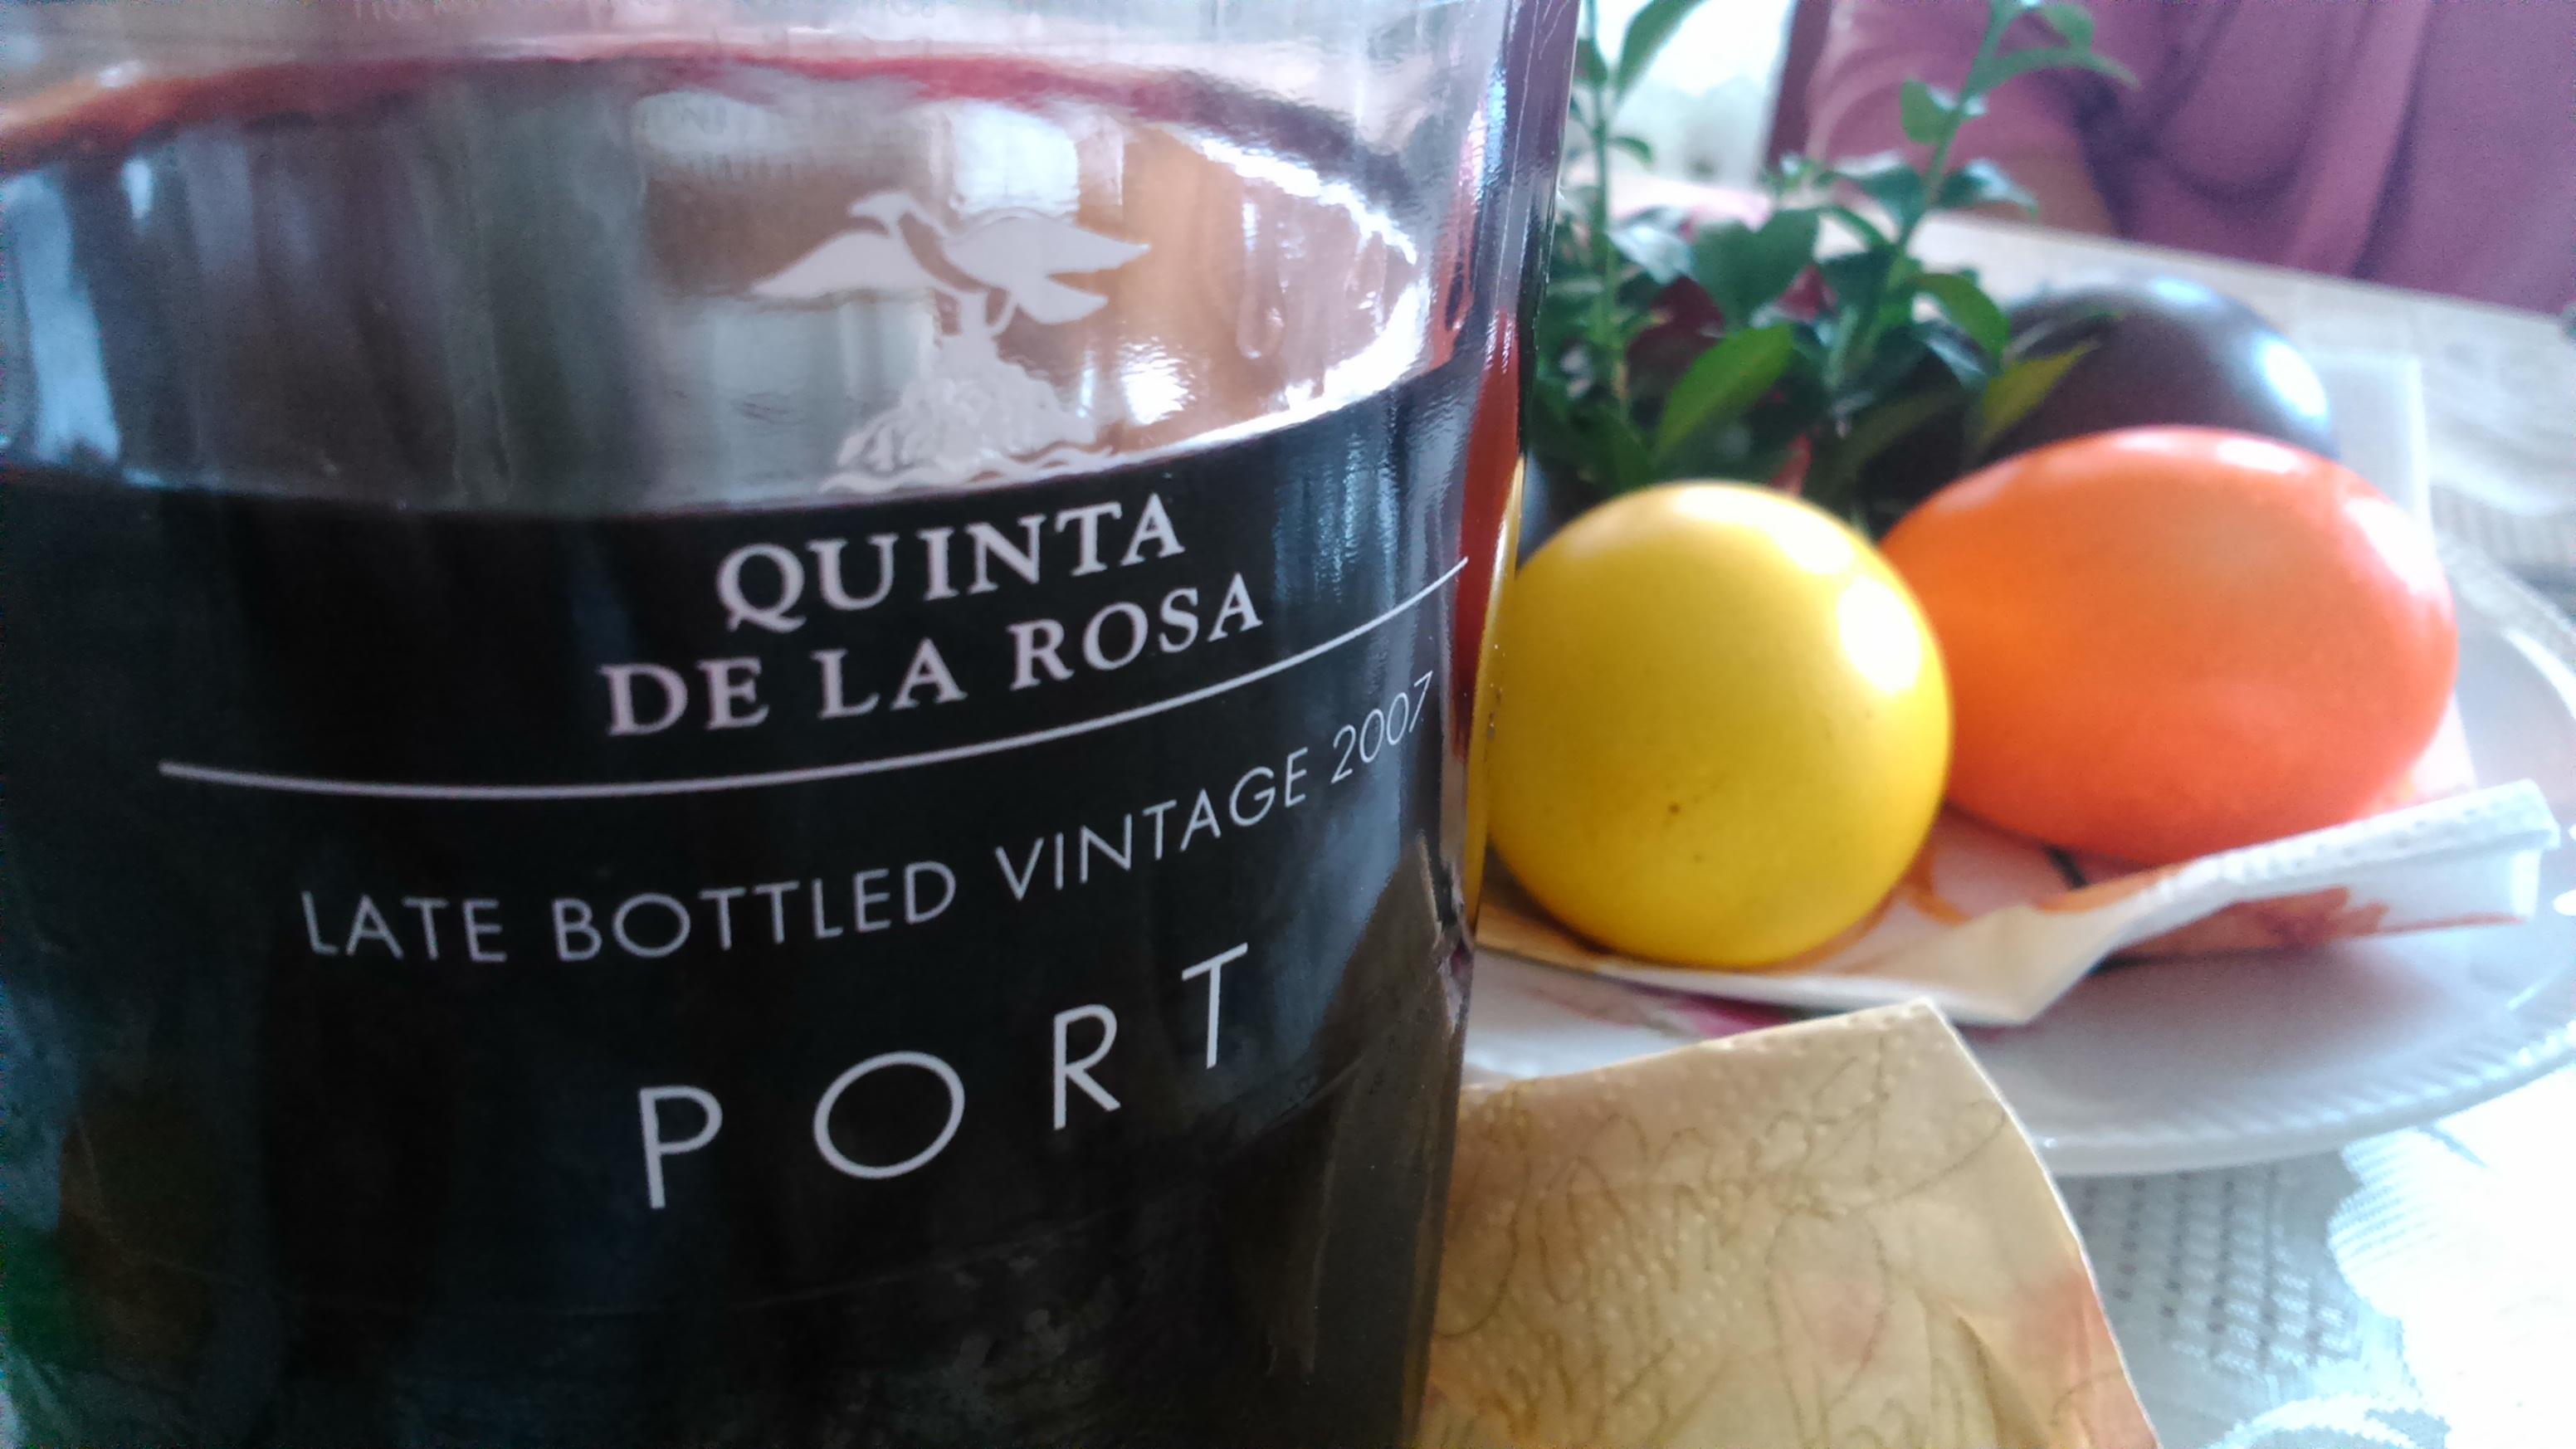 Wino Wina Sstarwines Wino Na Gwiazdke Wina 32000 Wpisow